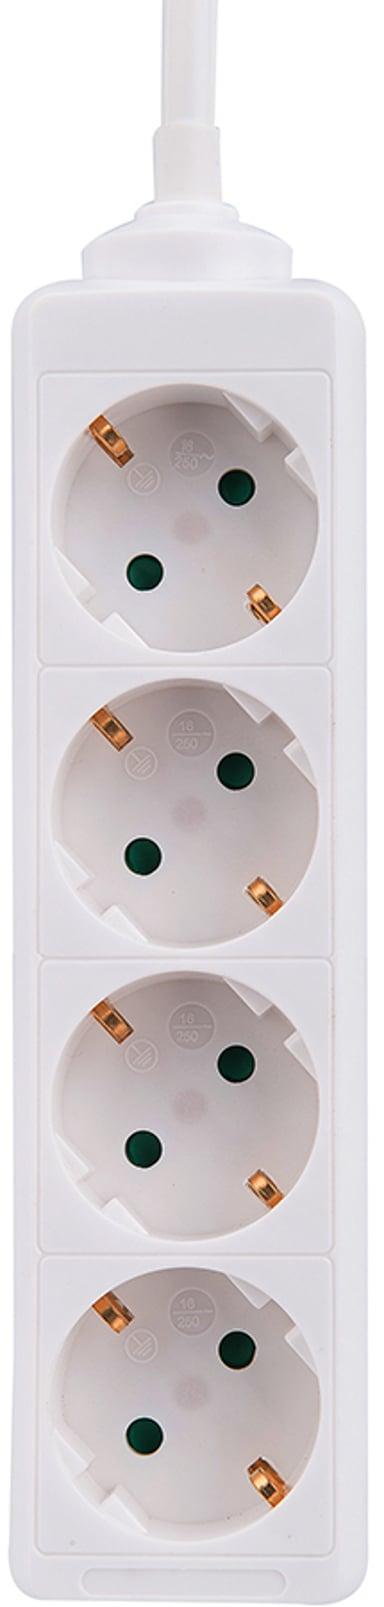 Prokord Prokord Power Socket 4Xsocket 1.5m White 4stuks Voeding CEE 7/4